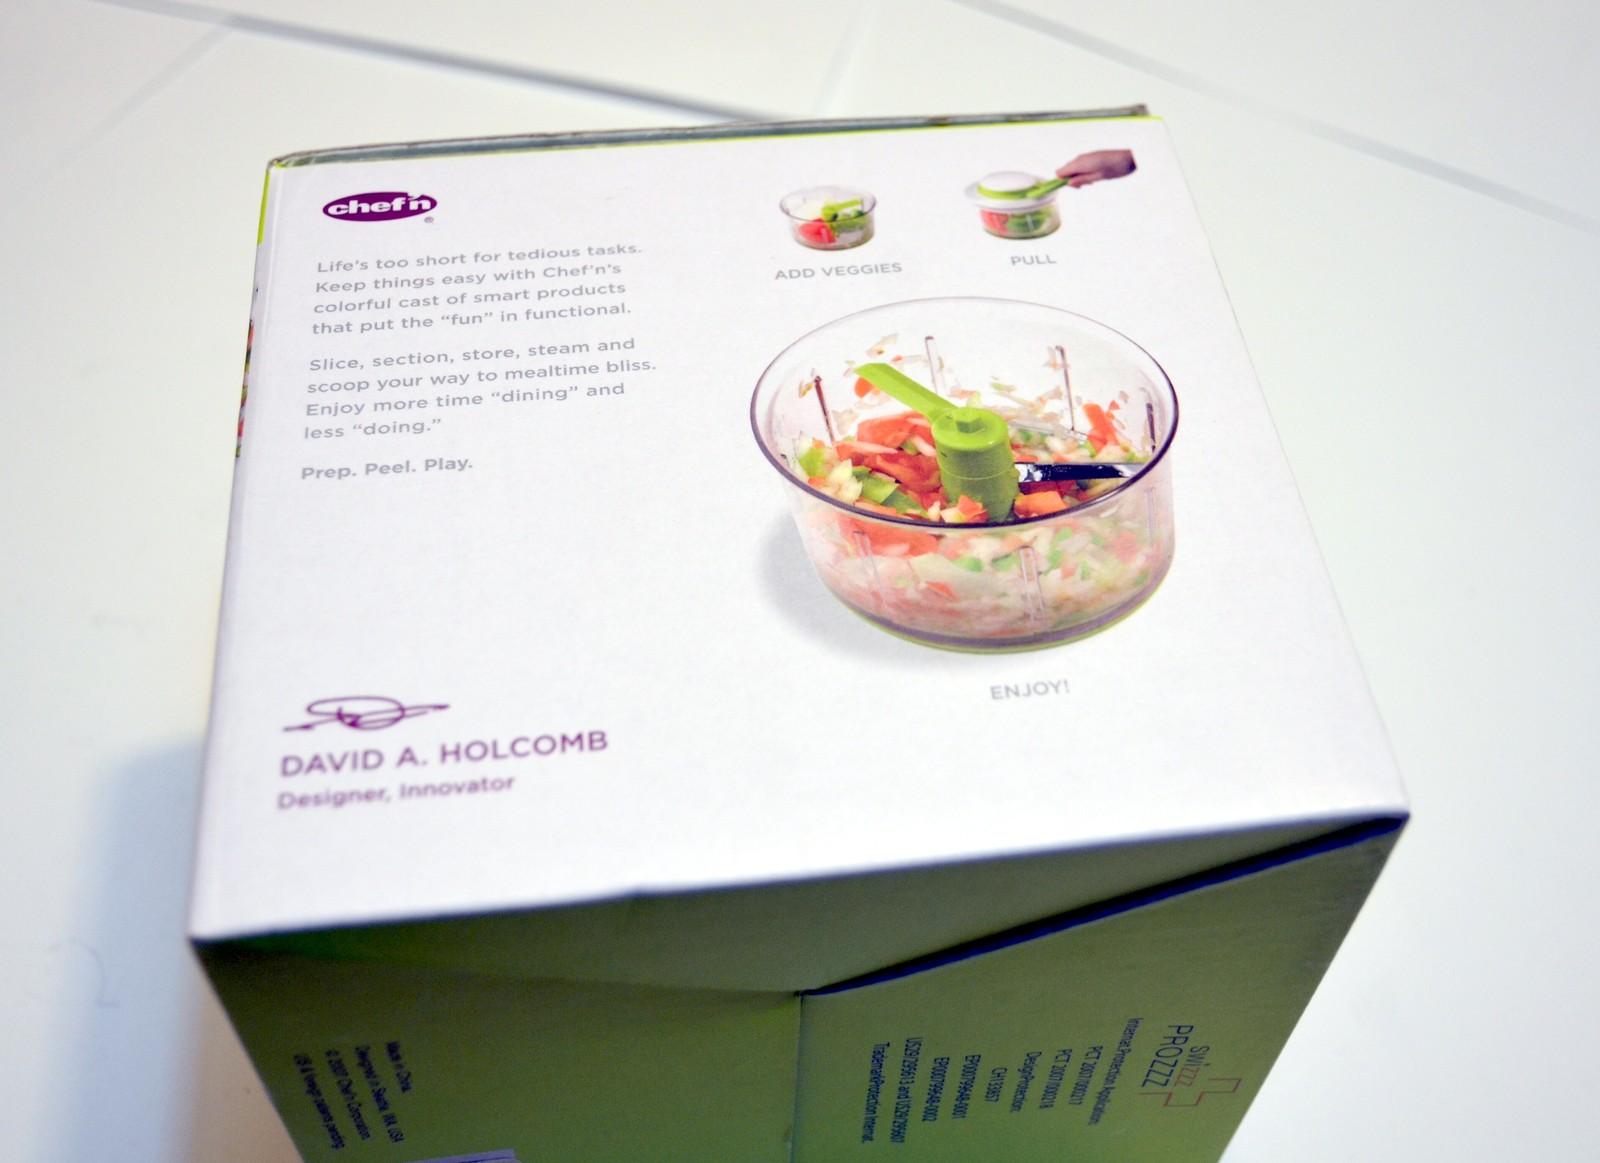 Chef\'n VeggiChop Hand-Powered Food Chopper and 50 similar items